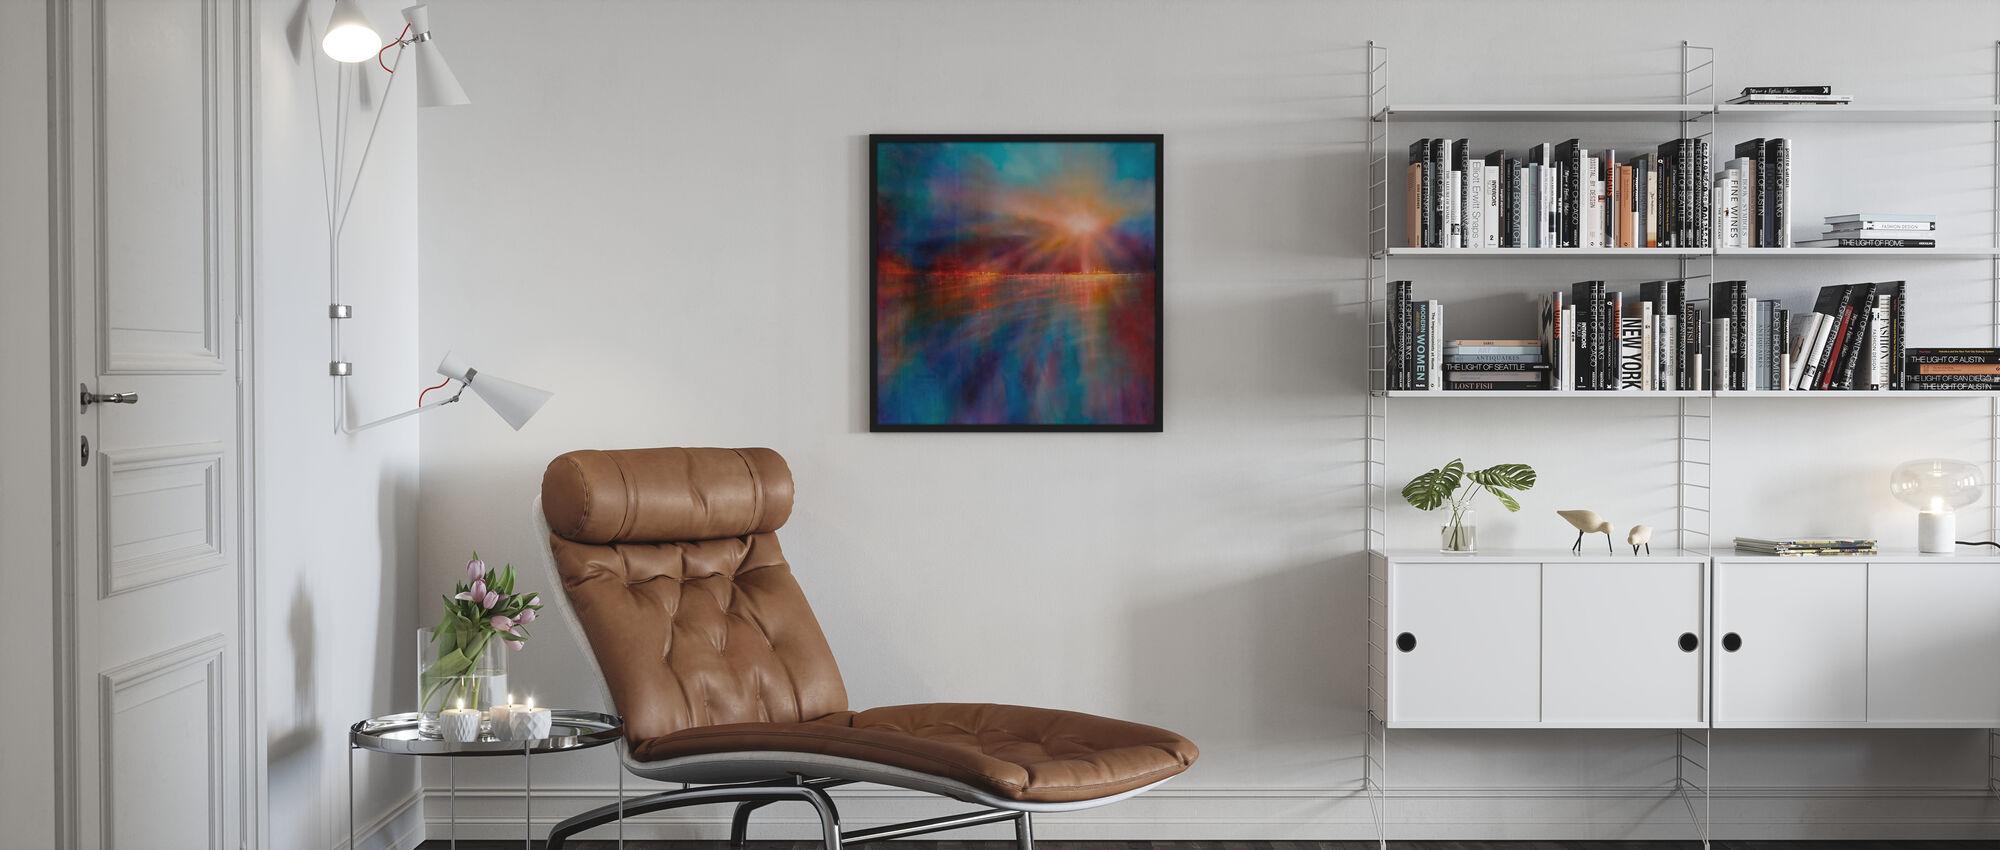 Another Morning - Framed print - Living Room